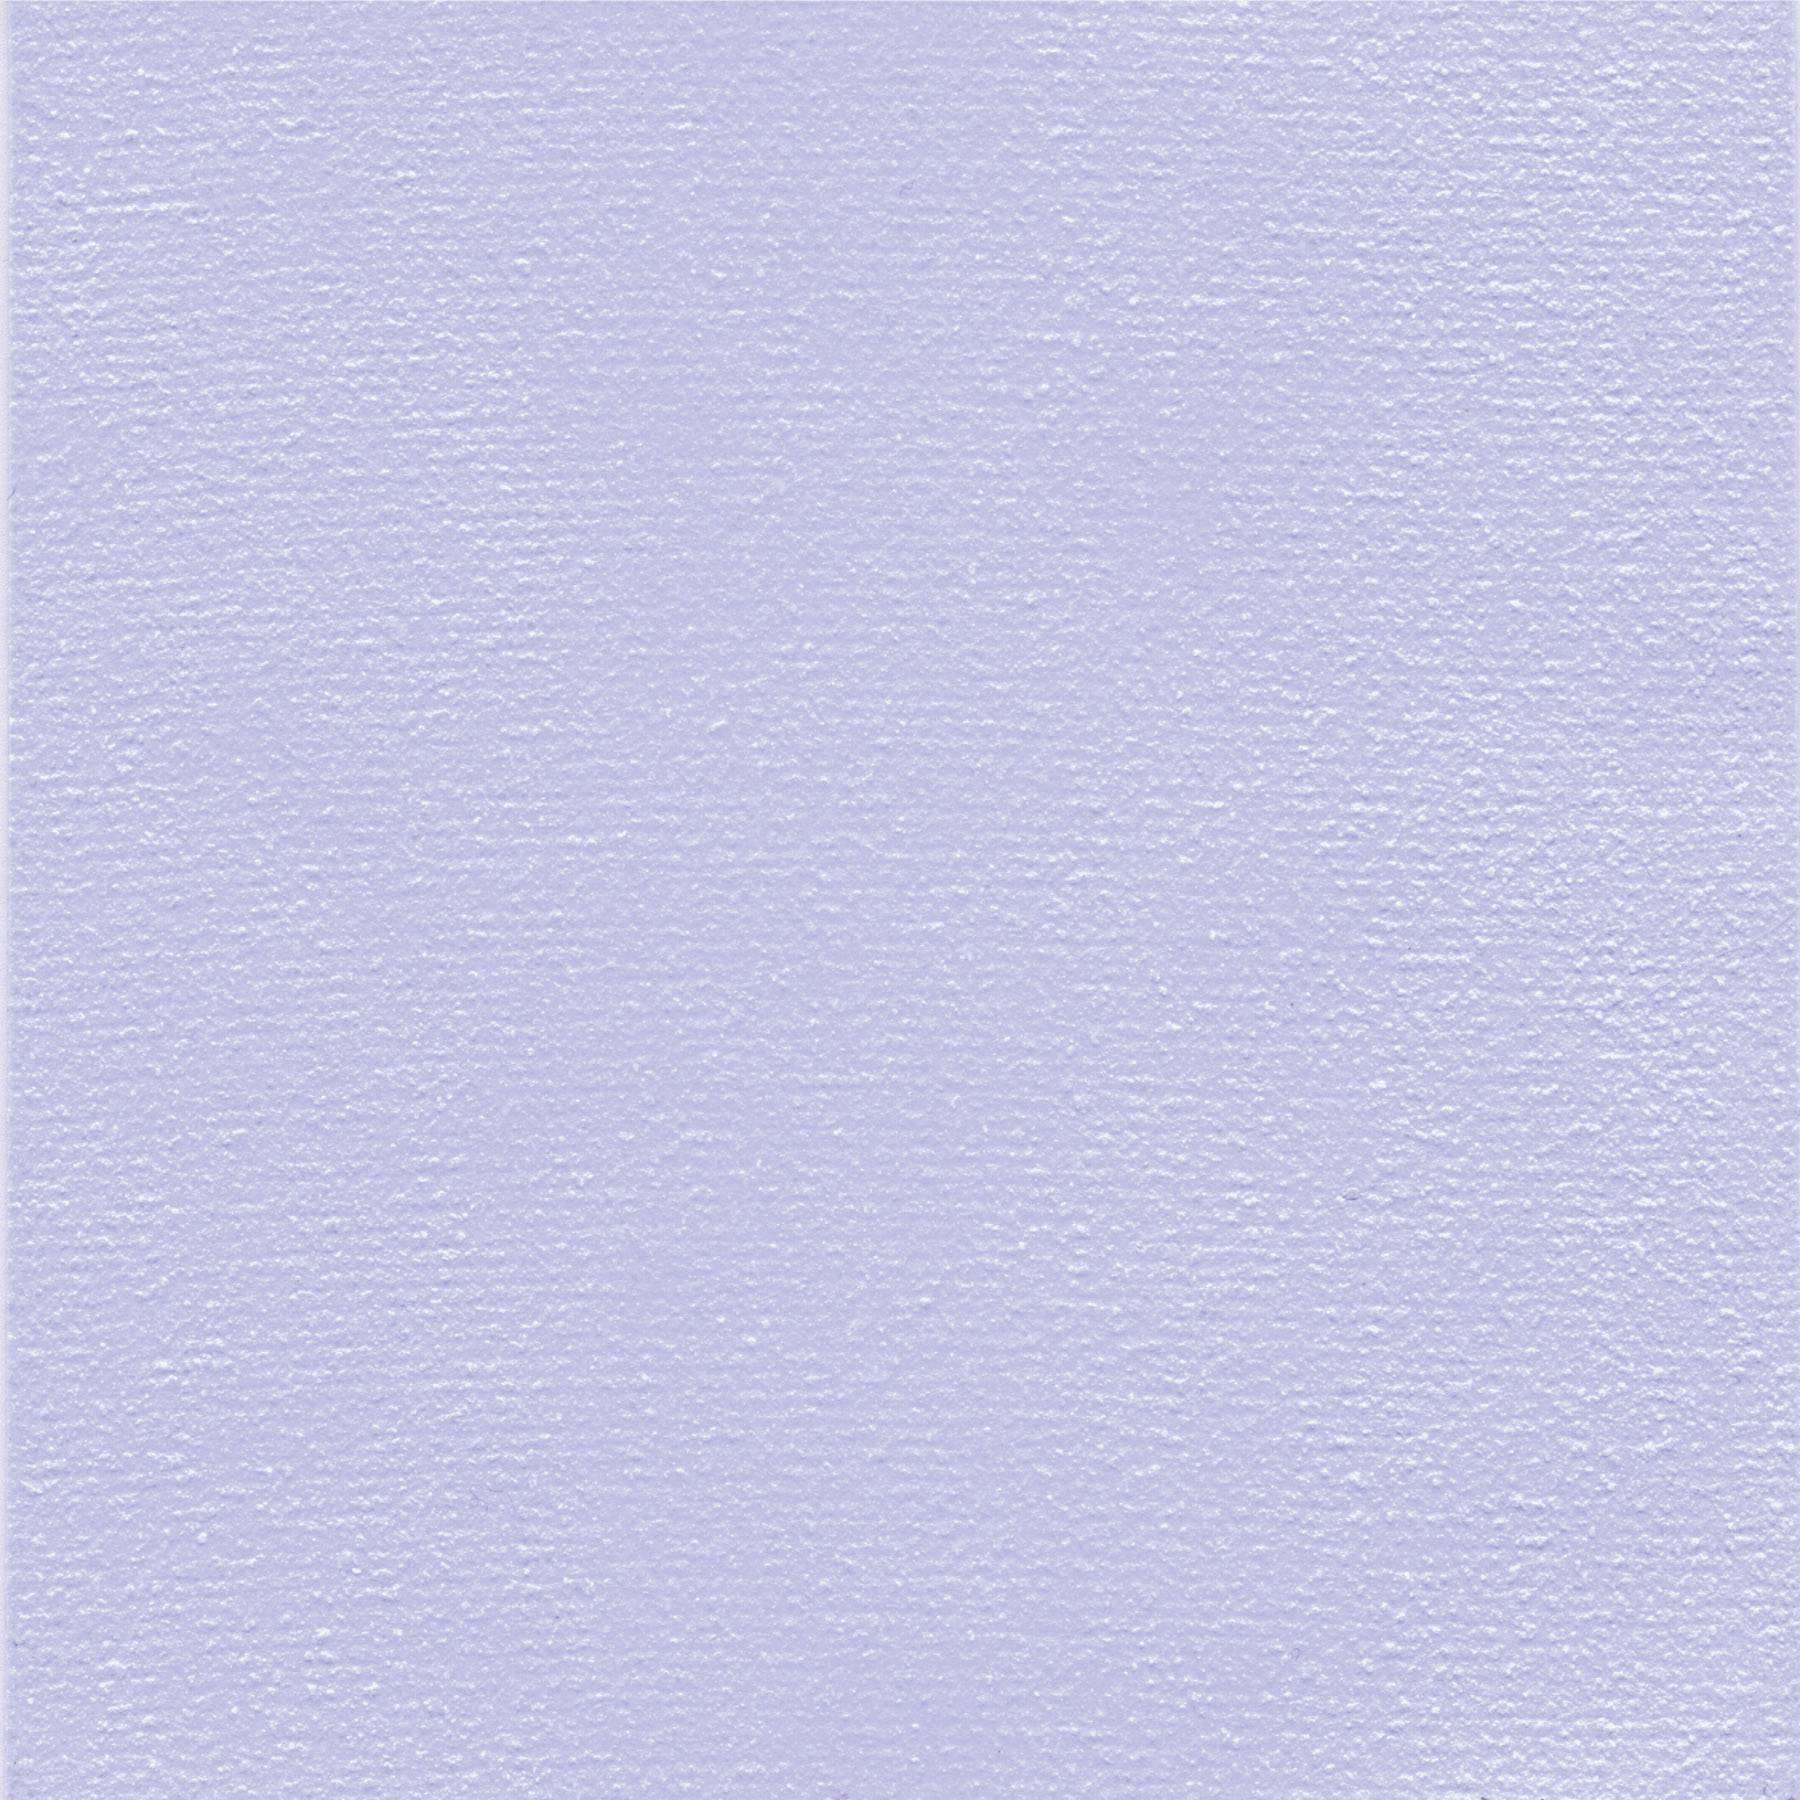 Teplovodivá fólia Kerafol SOFTTHERM 86/300, 3 mm, 3 W/mK, (d x š) 200 mm x 120 mm